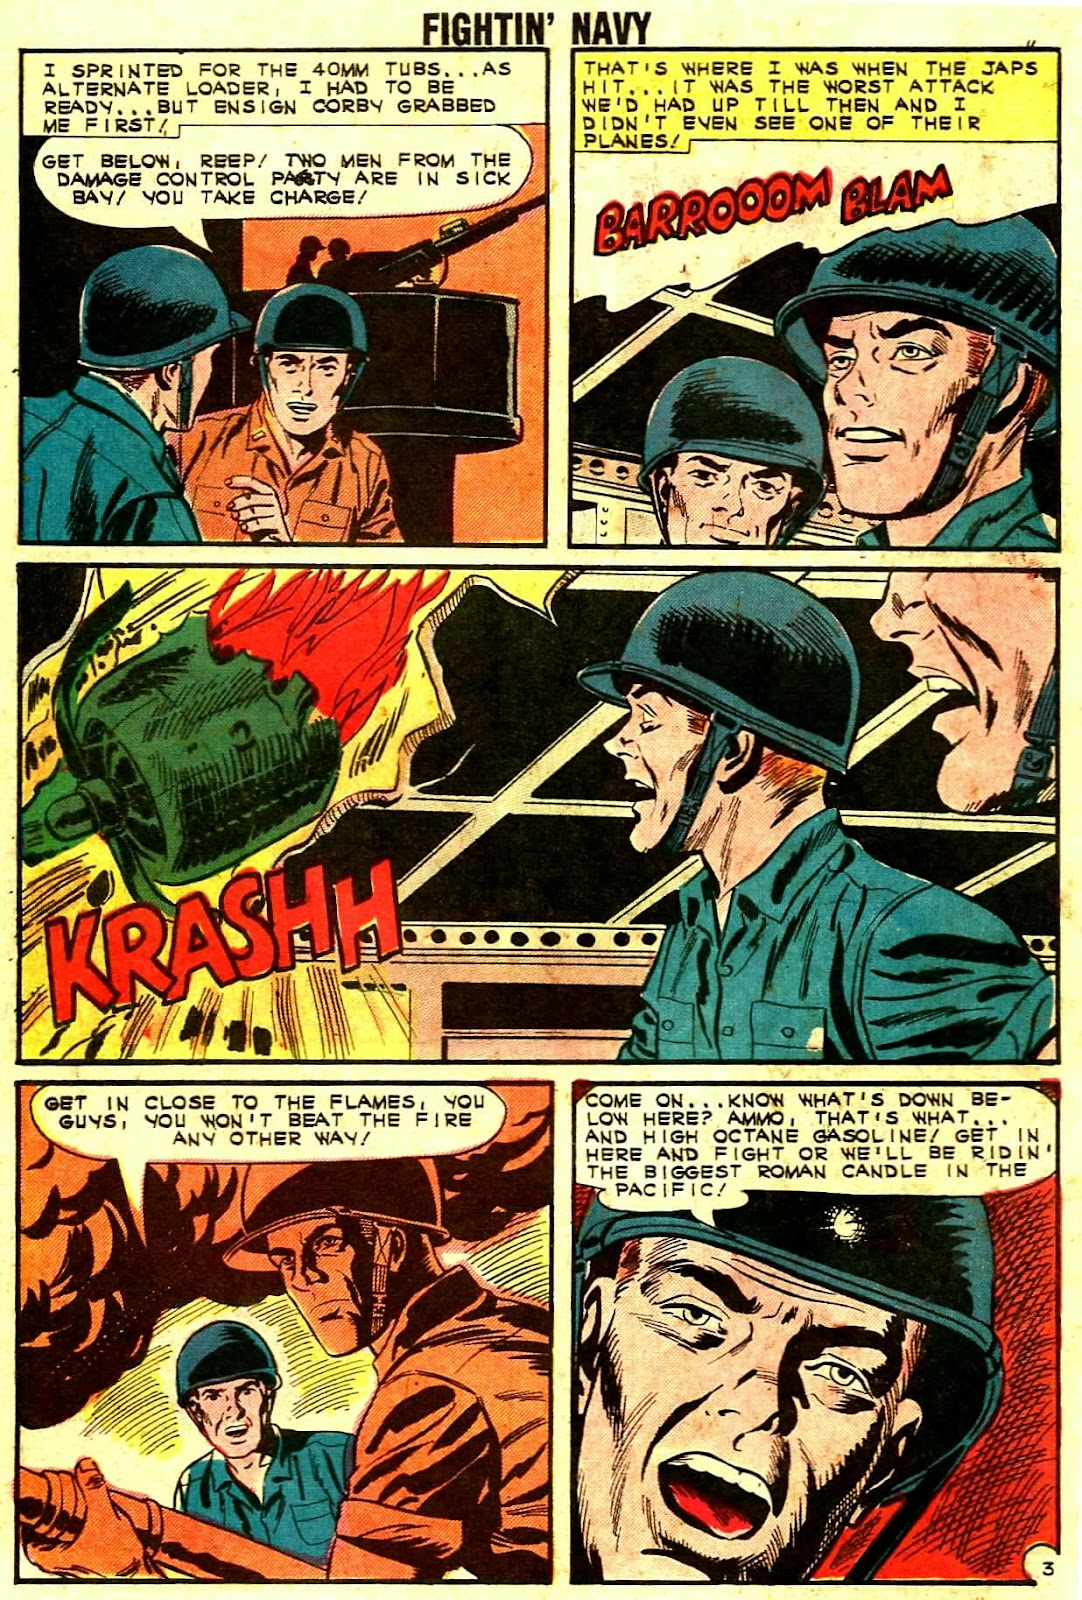 Read online Fightin' Navy comic -  Issue #109 - 10